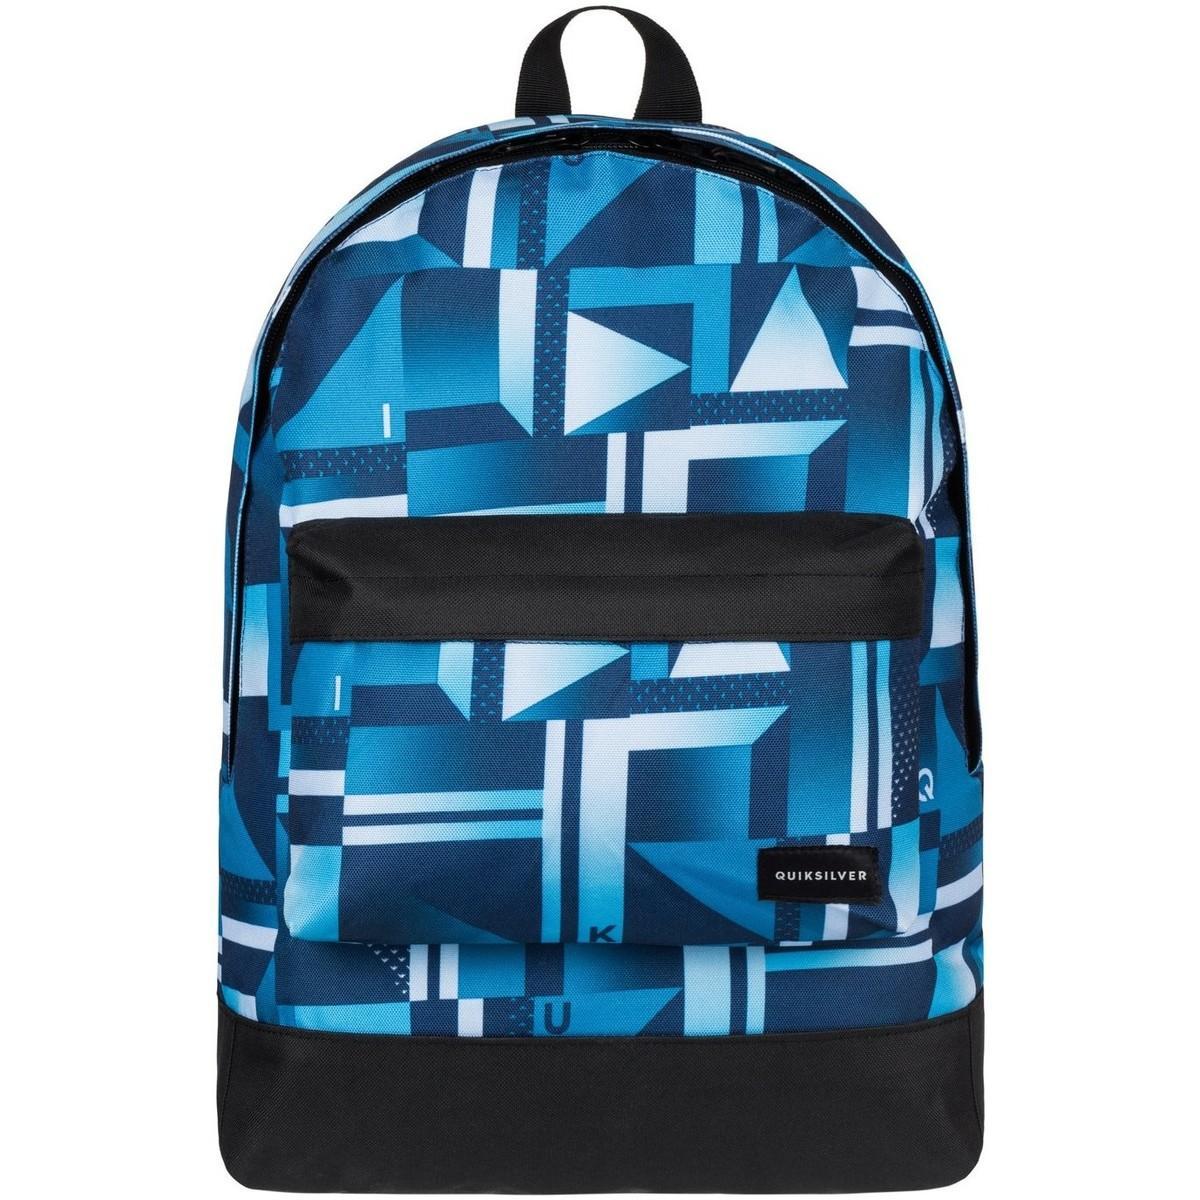 df7c5ac17cd89 Quiksilver Everyday Poster - Medium Backpack Men s Backpack In Blue ...